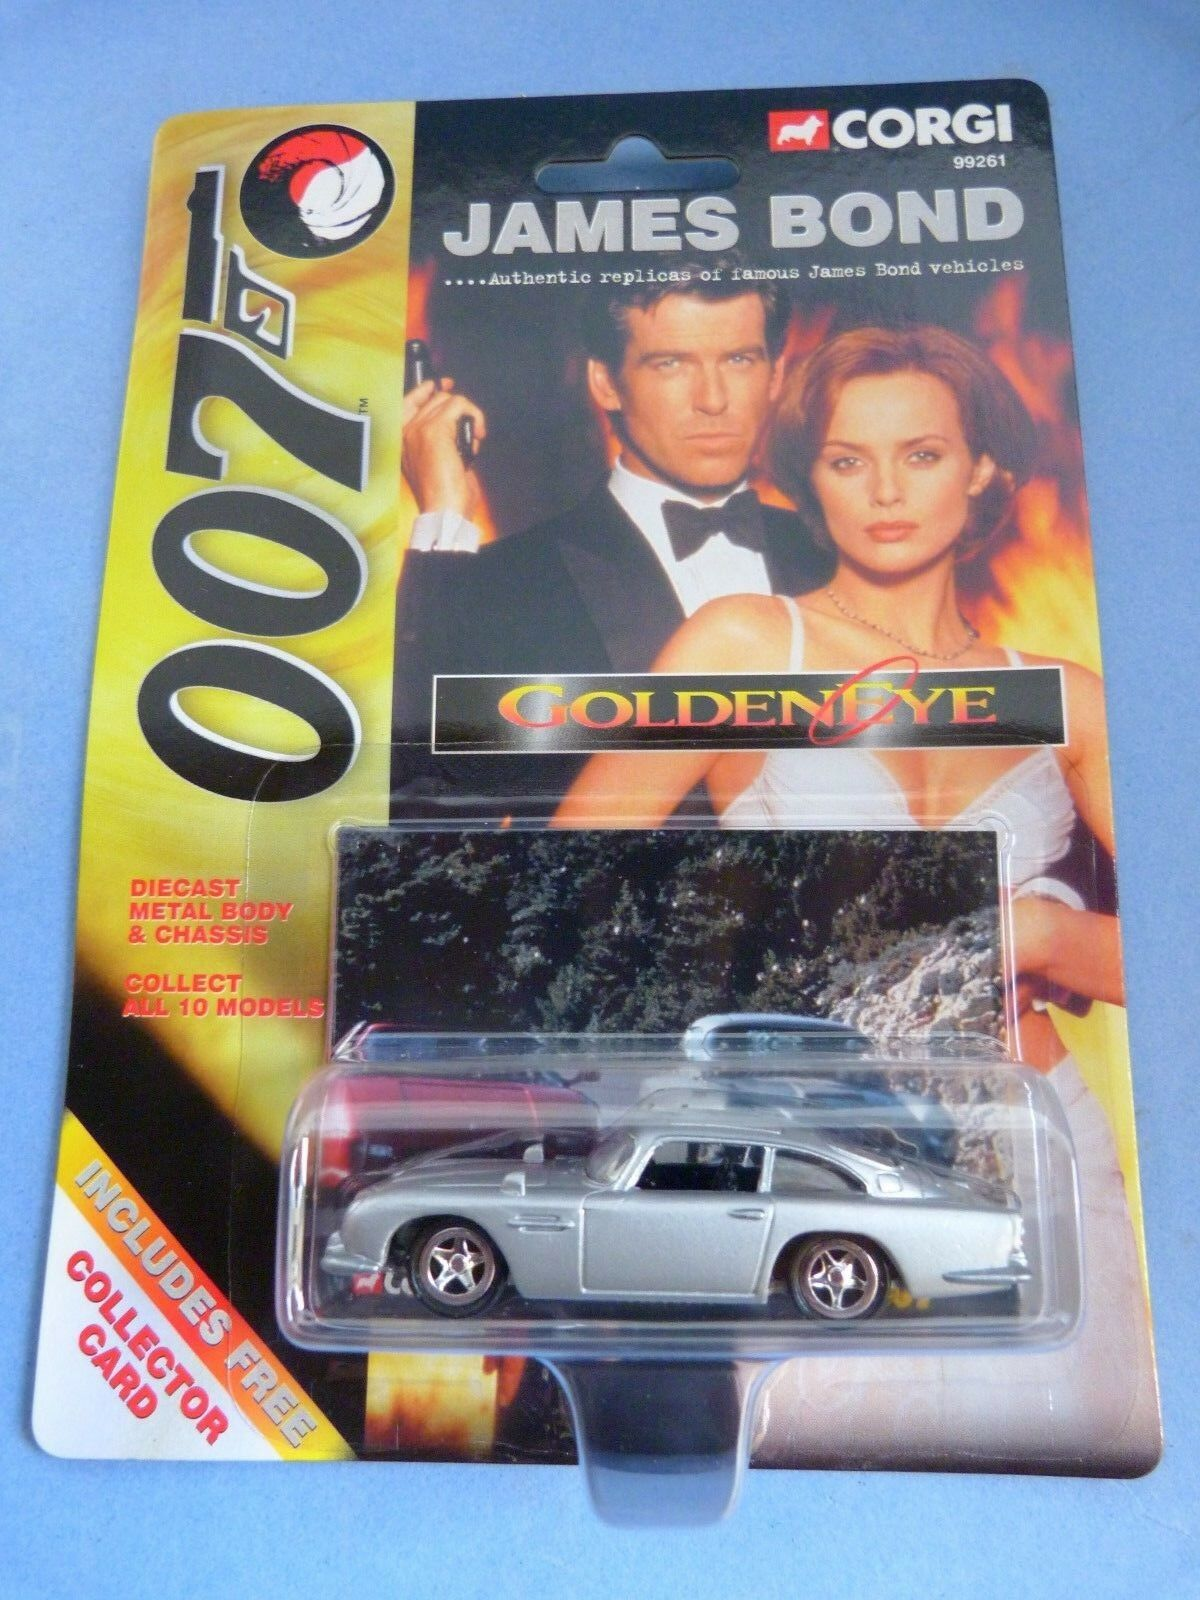 Cars 1 64 - corgi-complete collection 12 cars james bond 007 + maps